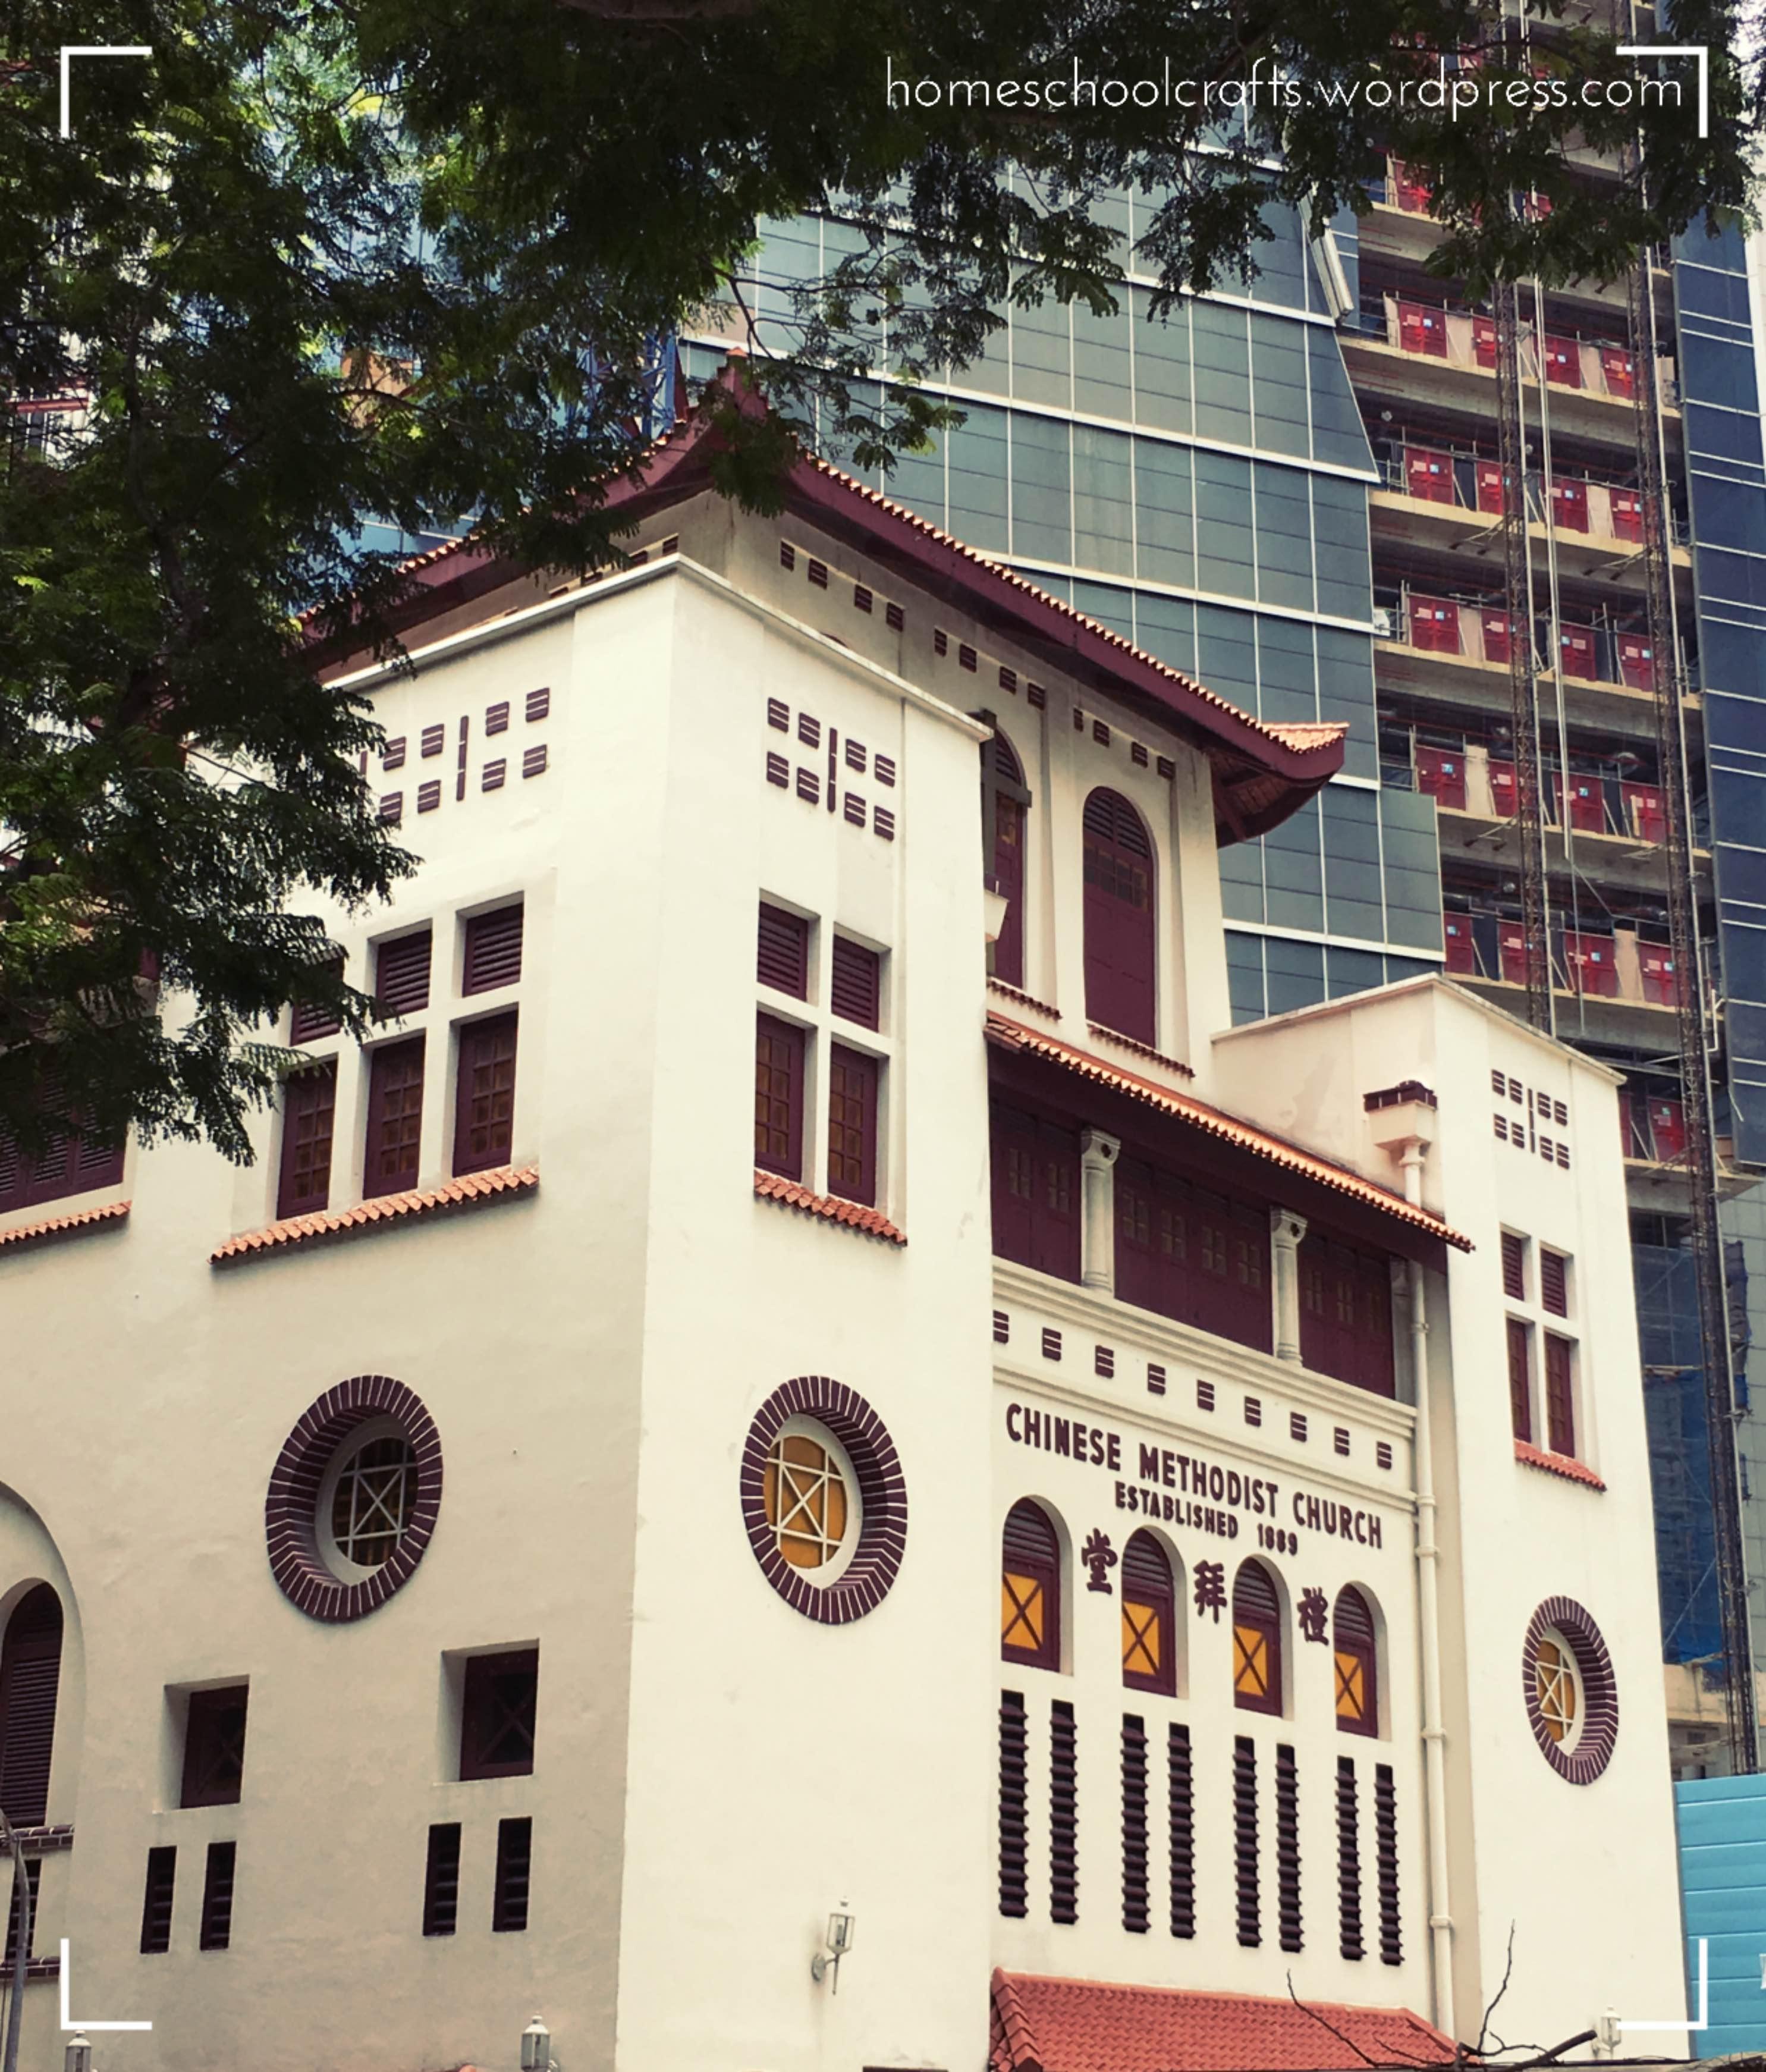 Chinatown-Trail-Singapore-Chinese-Methodist-Church-Homeschool-Crafts